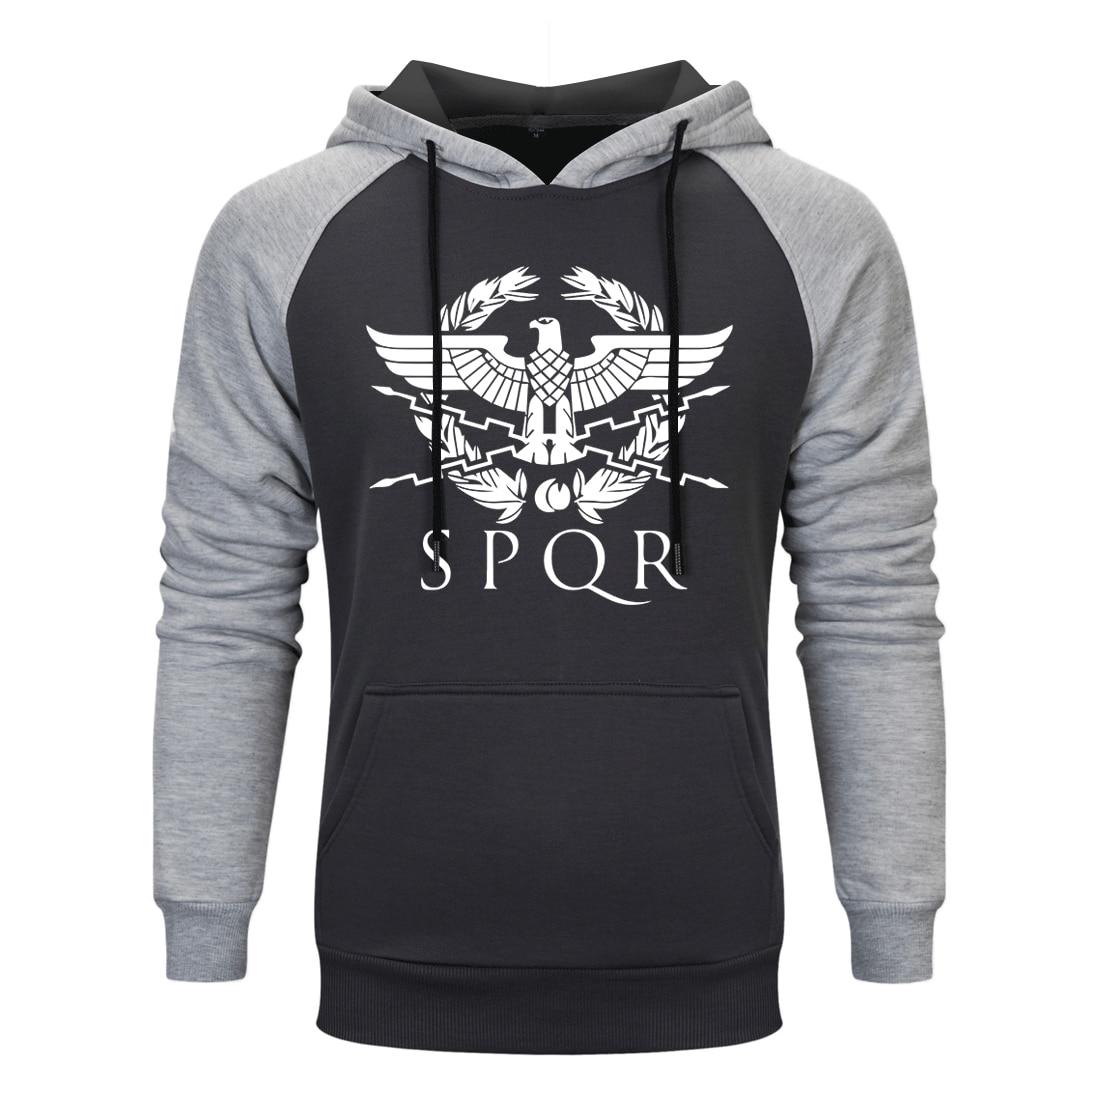 Men Print Spqr Gladiator Imperial Raglan Hoodies 2020 Spring Autumn Streetwear Mans Sweatshirts Warm Fleece Pullovers Clothings